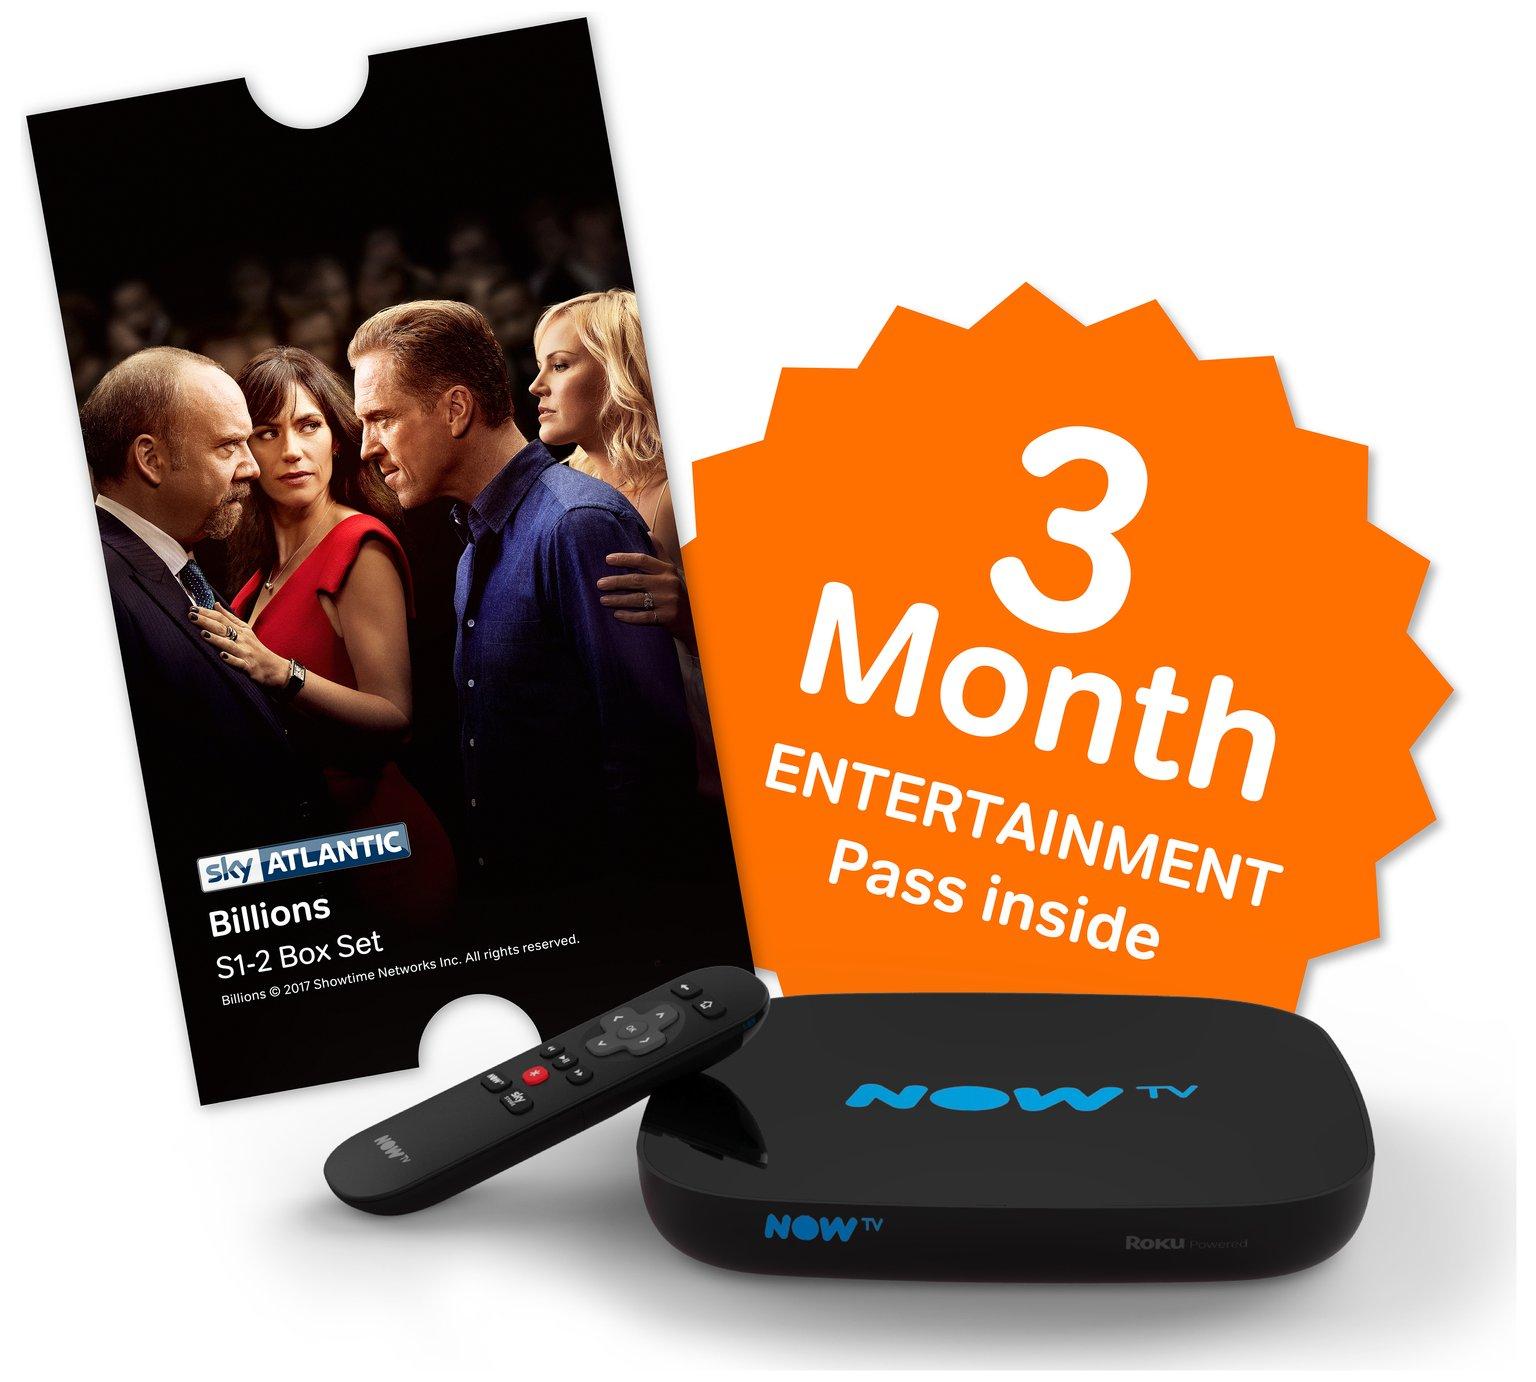 NOW TV New Smart Box + Sky Store Voucher + 3 Month Entertainment Pass £14.50 @ Tesco Direct (also Now TV Box + Sky Cinema 1 month pass + Belle Pop £10)